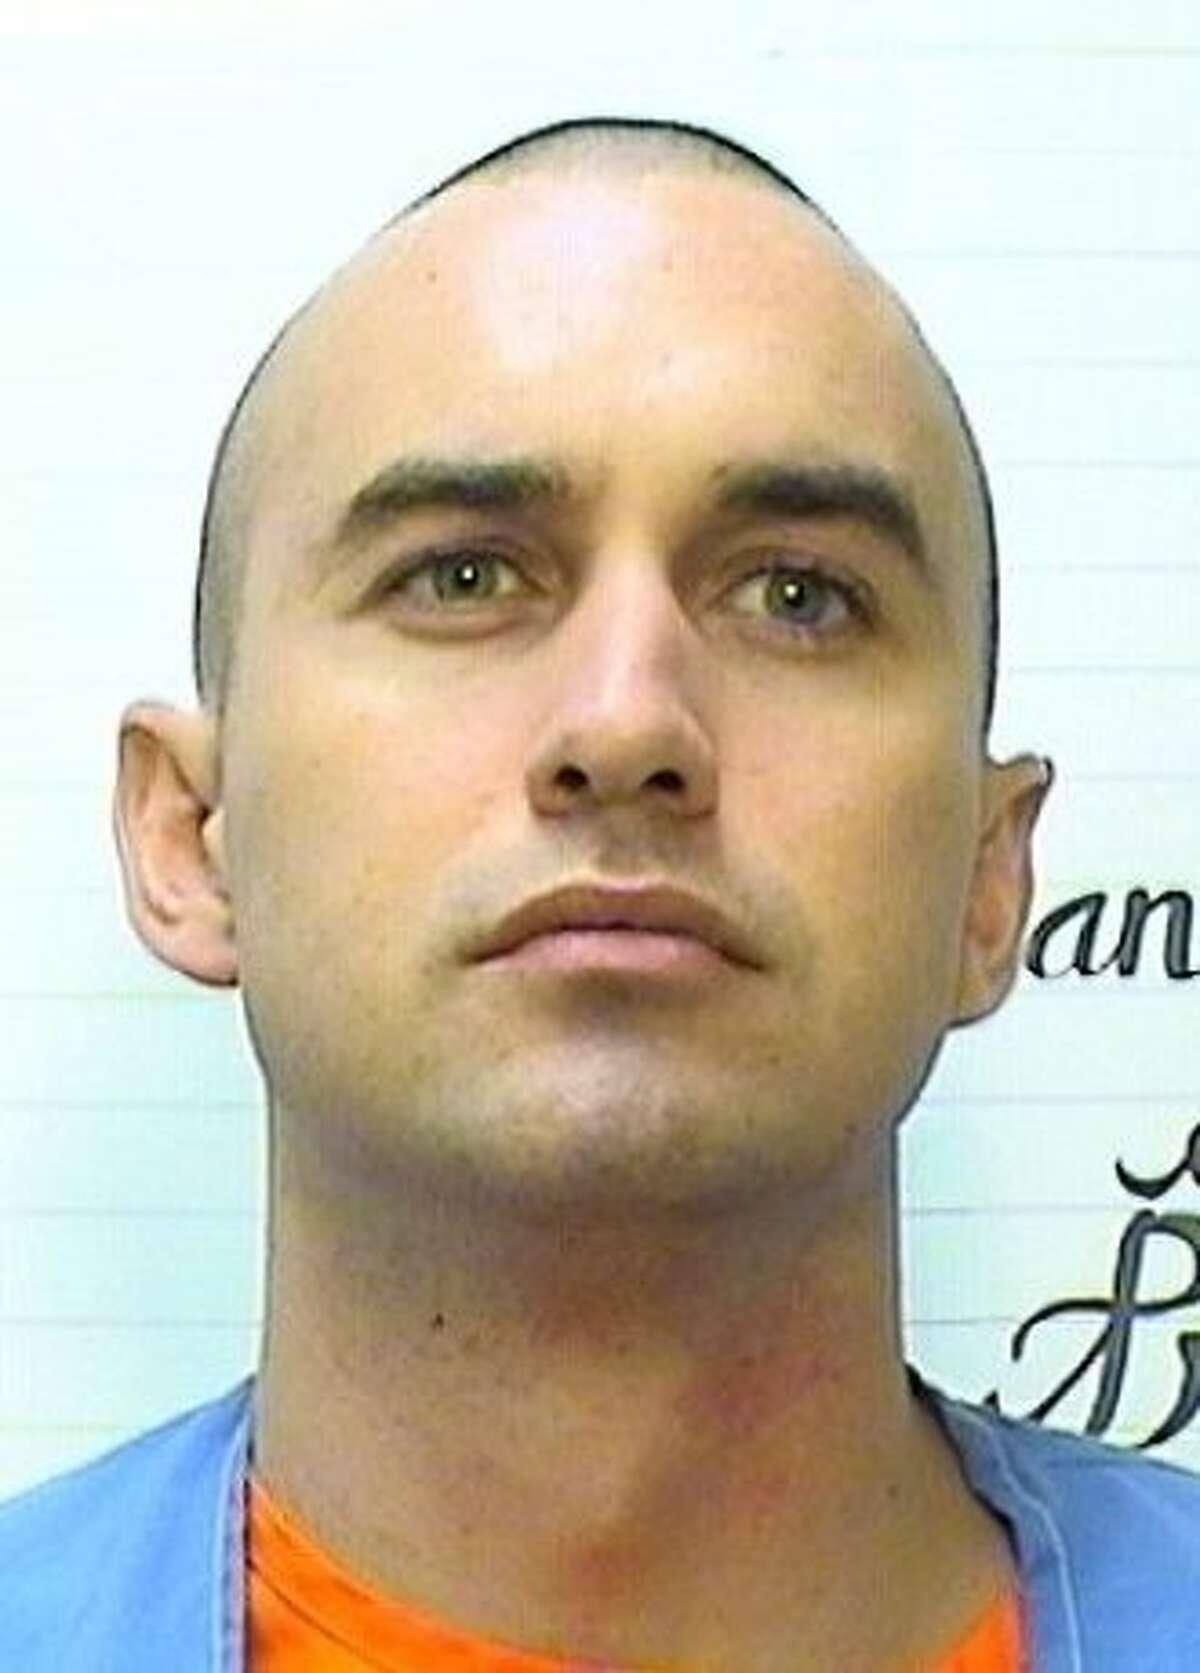 Thomas Edwin Halloran, who authorities say fatally shot an off-duty Marin County sheriff's deputy in Petaluma on July 18 , 2011.